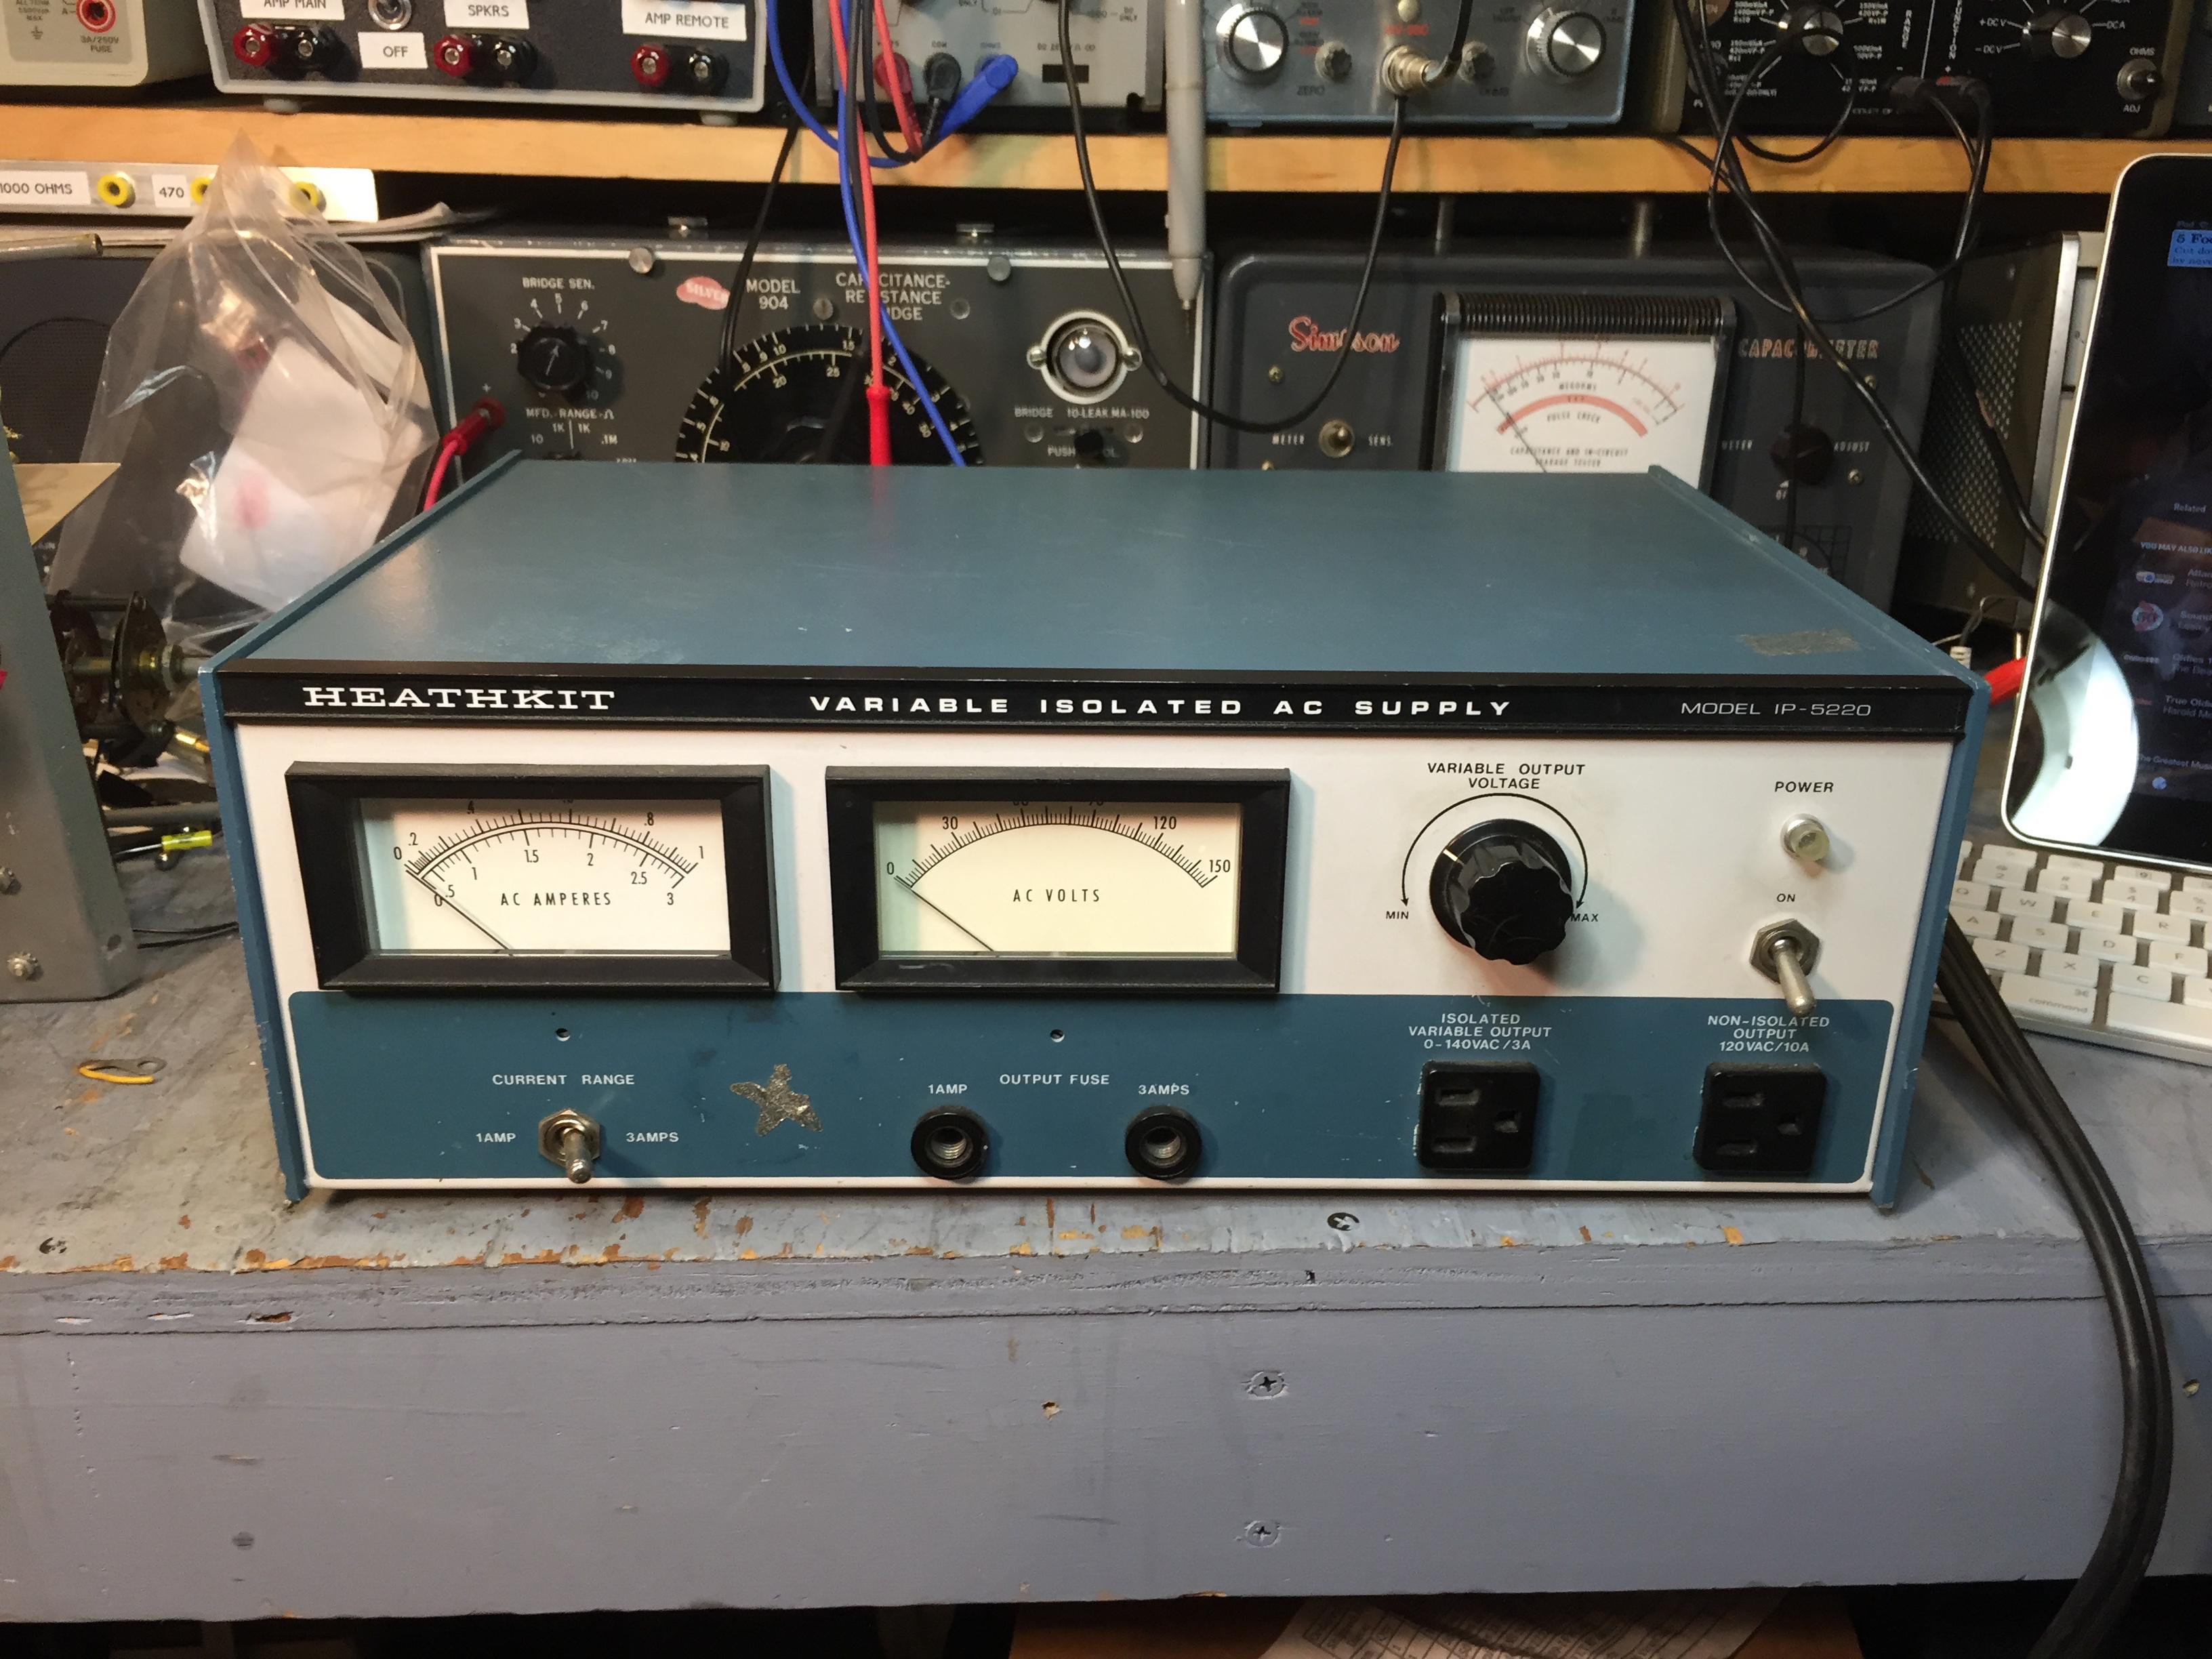 Wiring Diagram Ammeter Wiring Diagram Sunpro Voltmeter Wiring Diagram